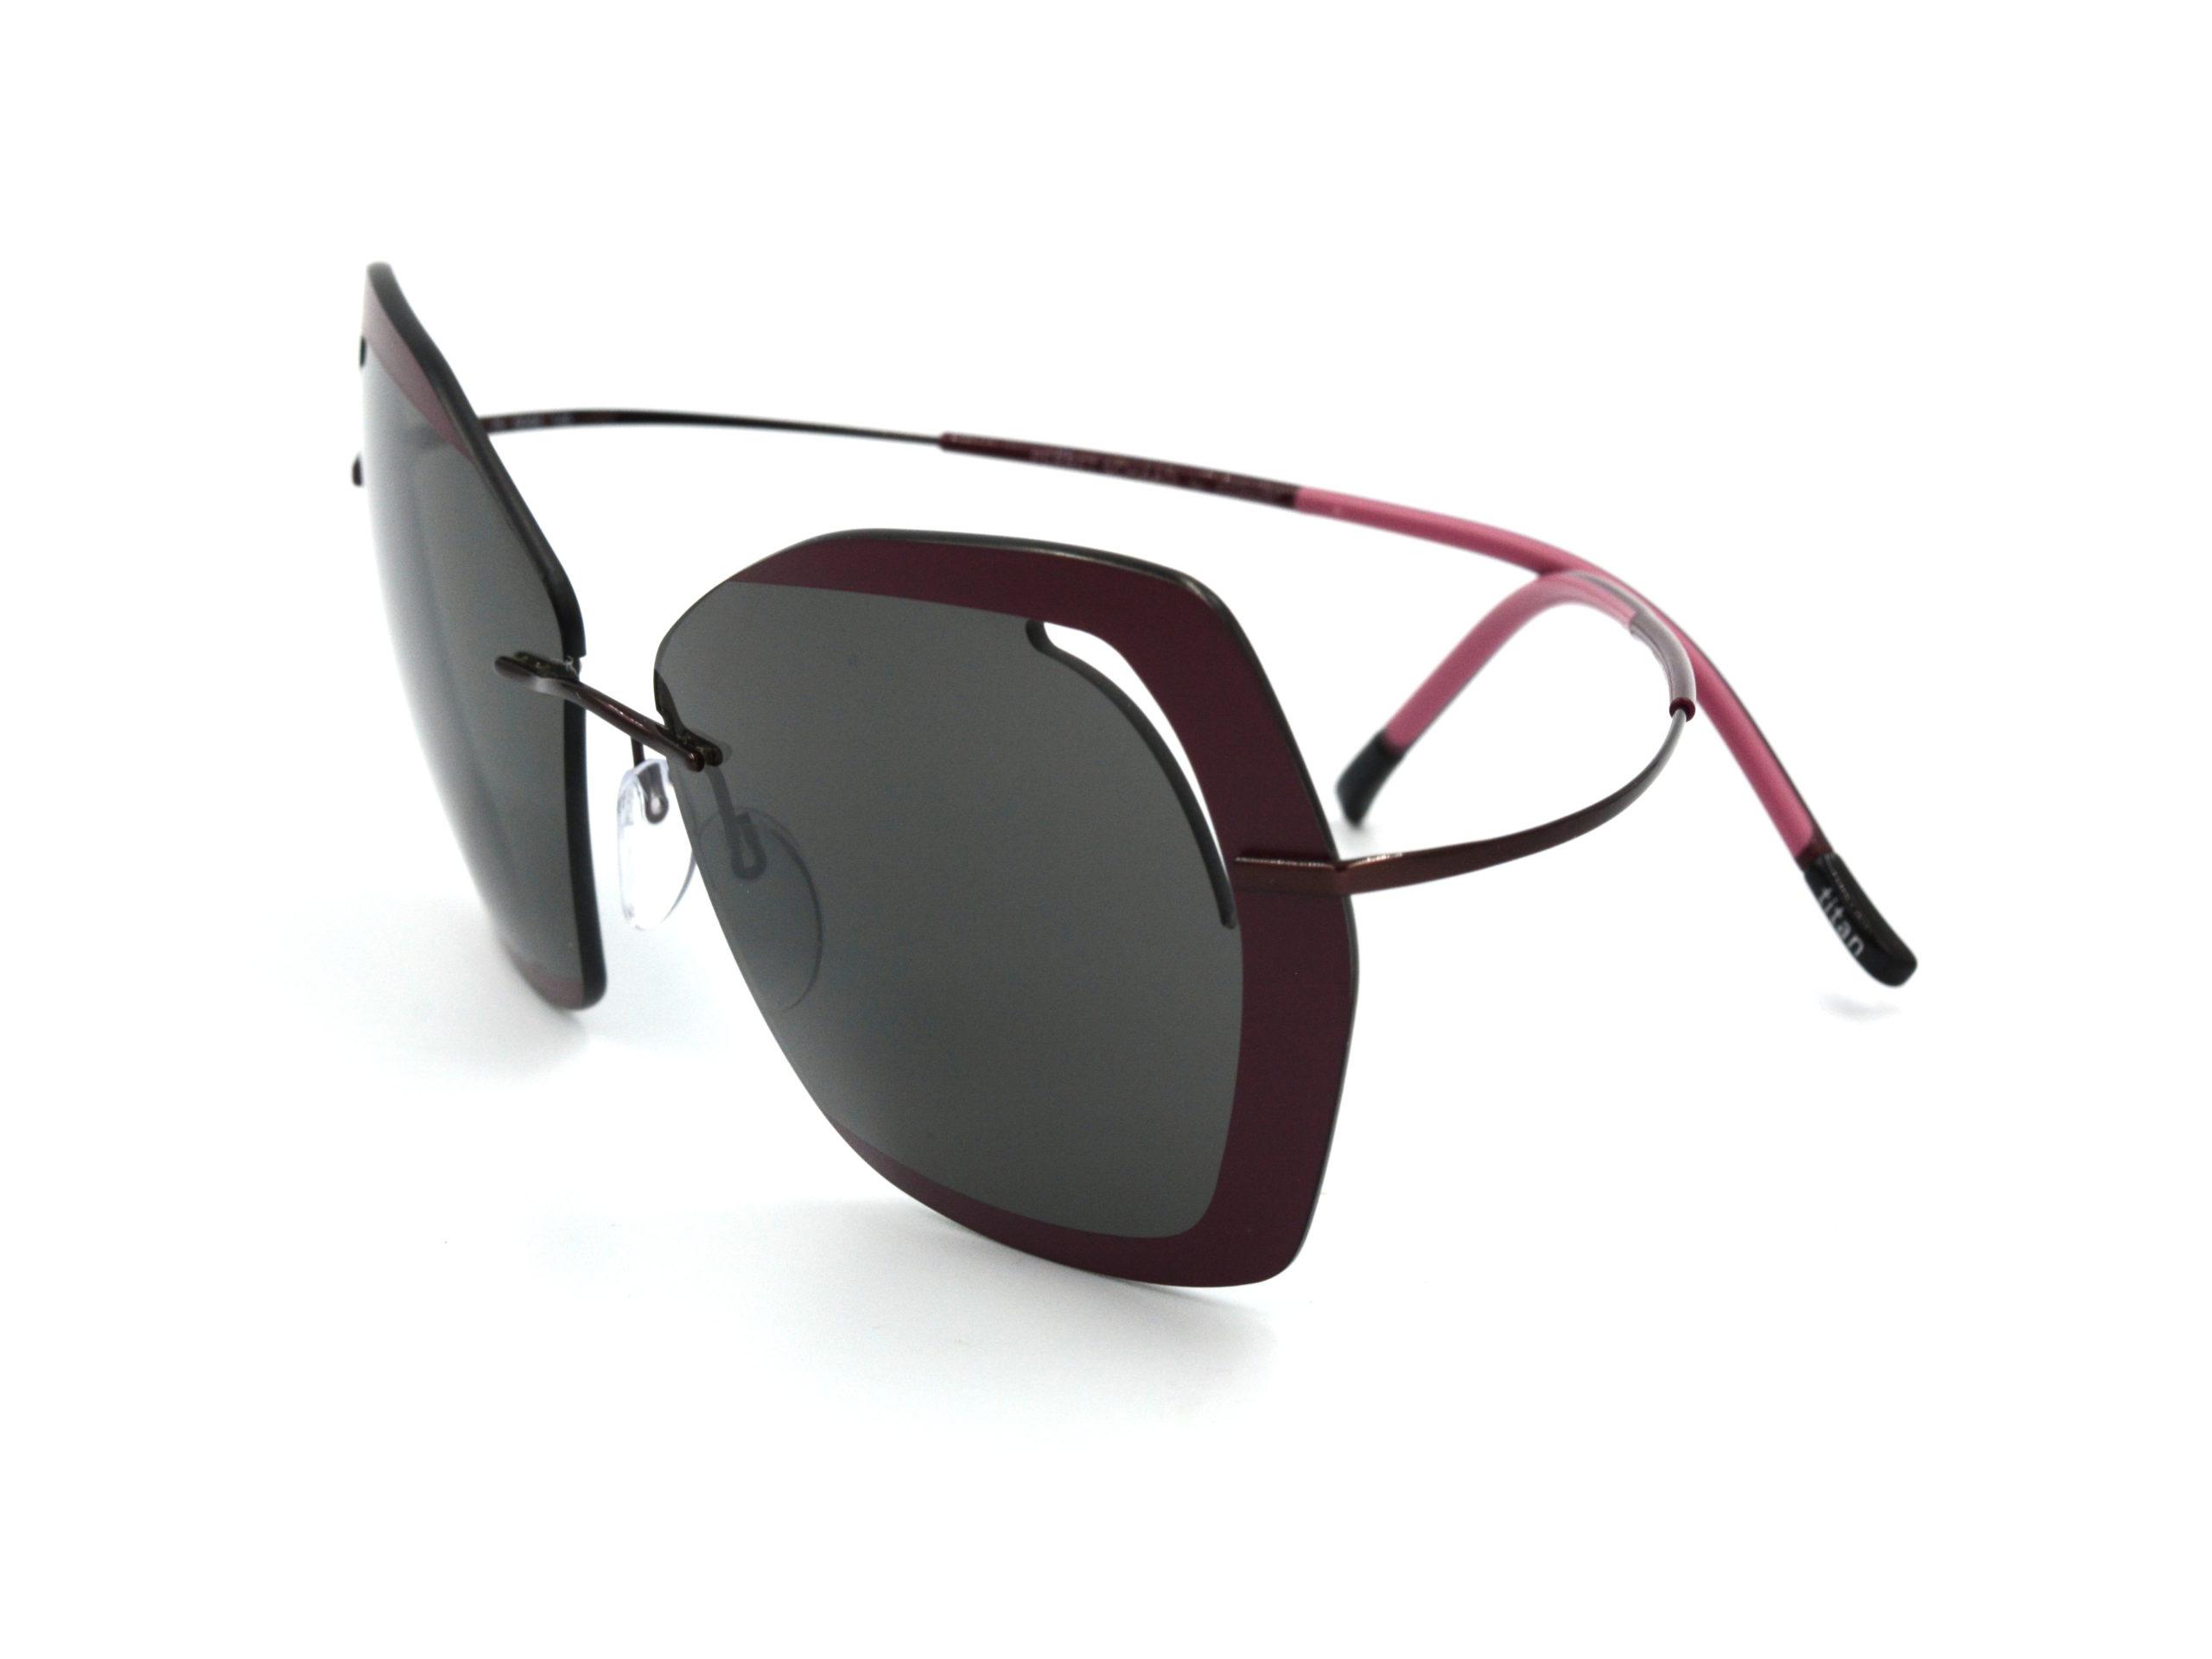 SILHOUETTE Perret Schaad 9910 6040 Sunglasses 2020